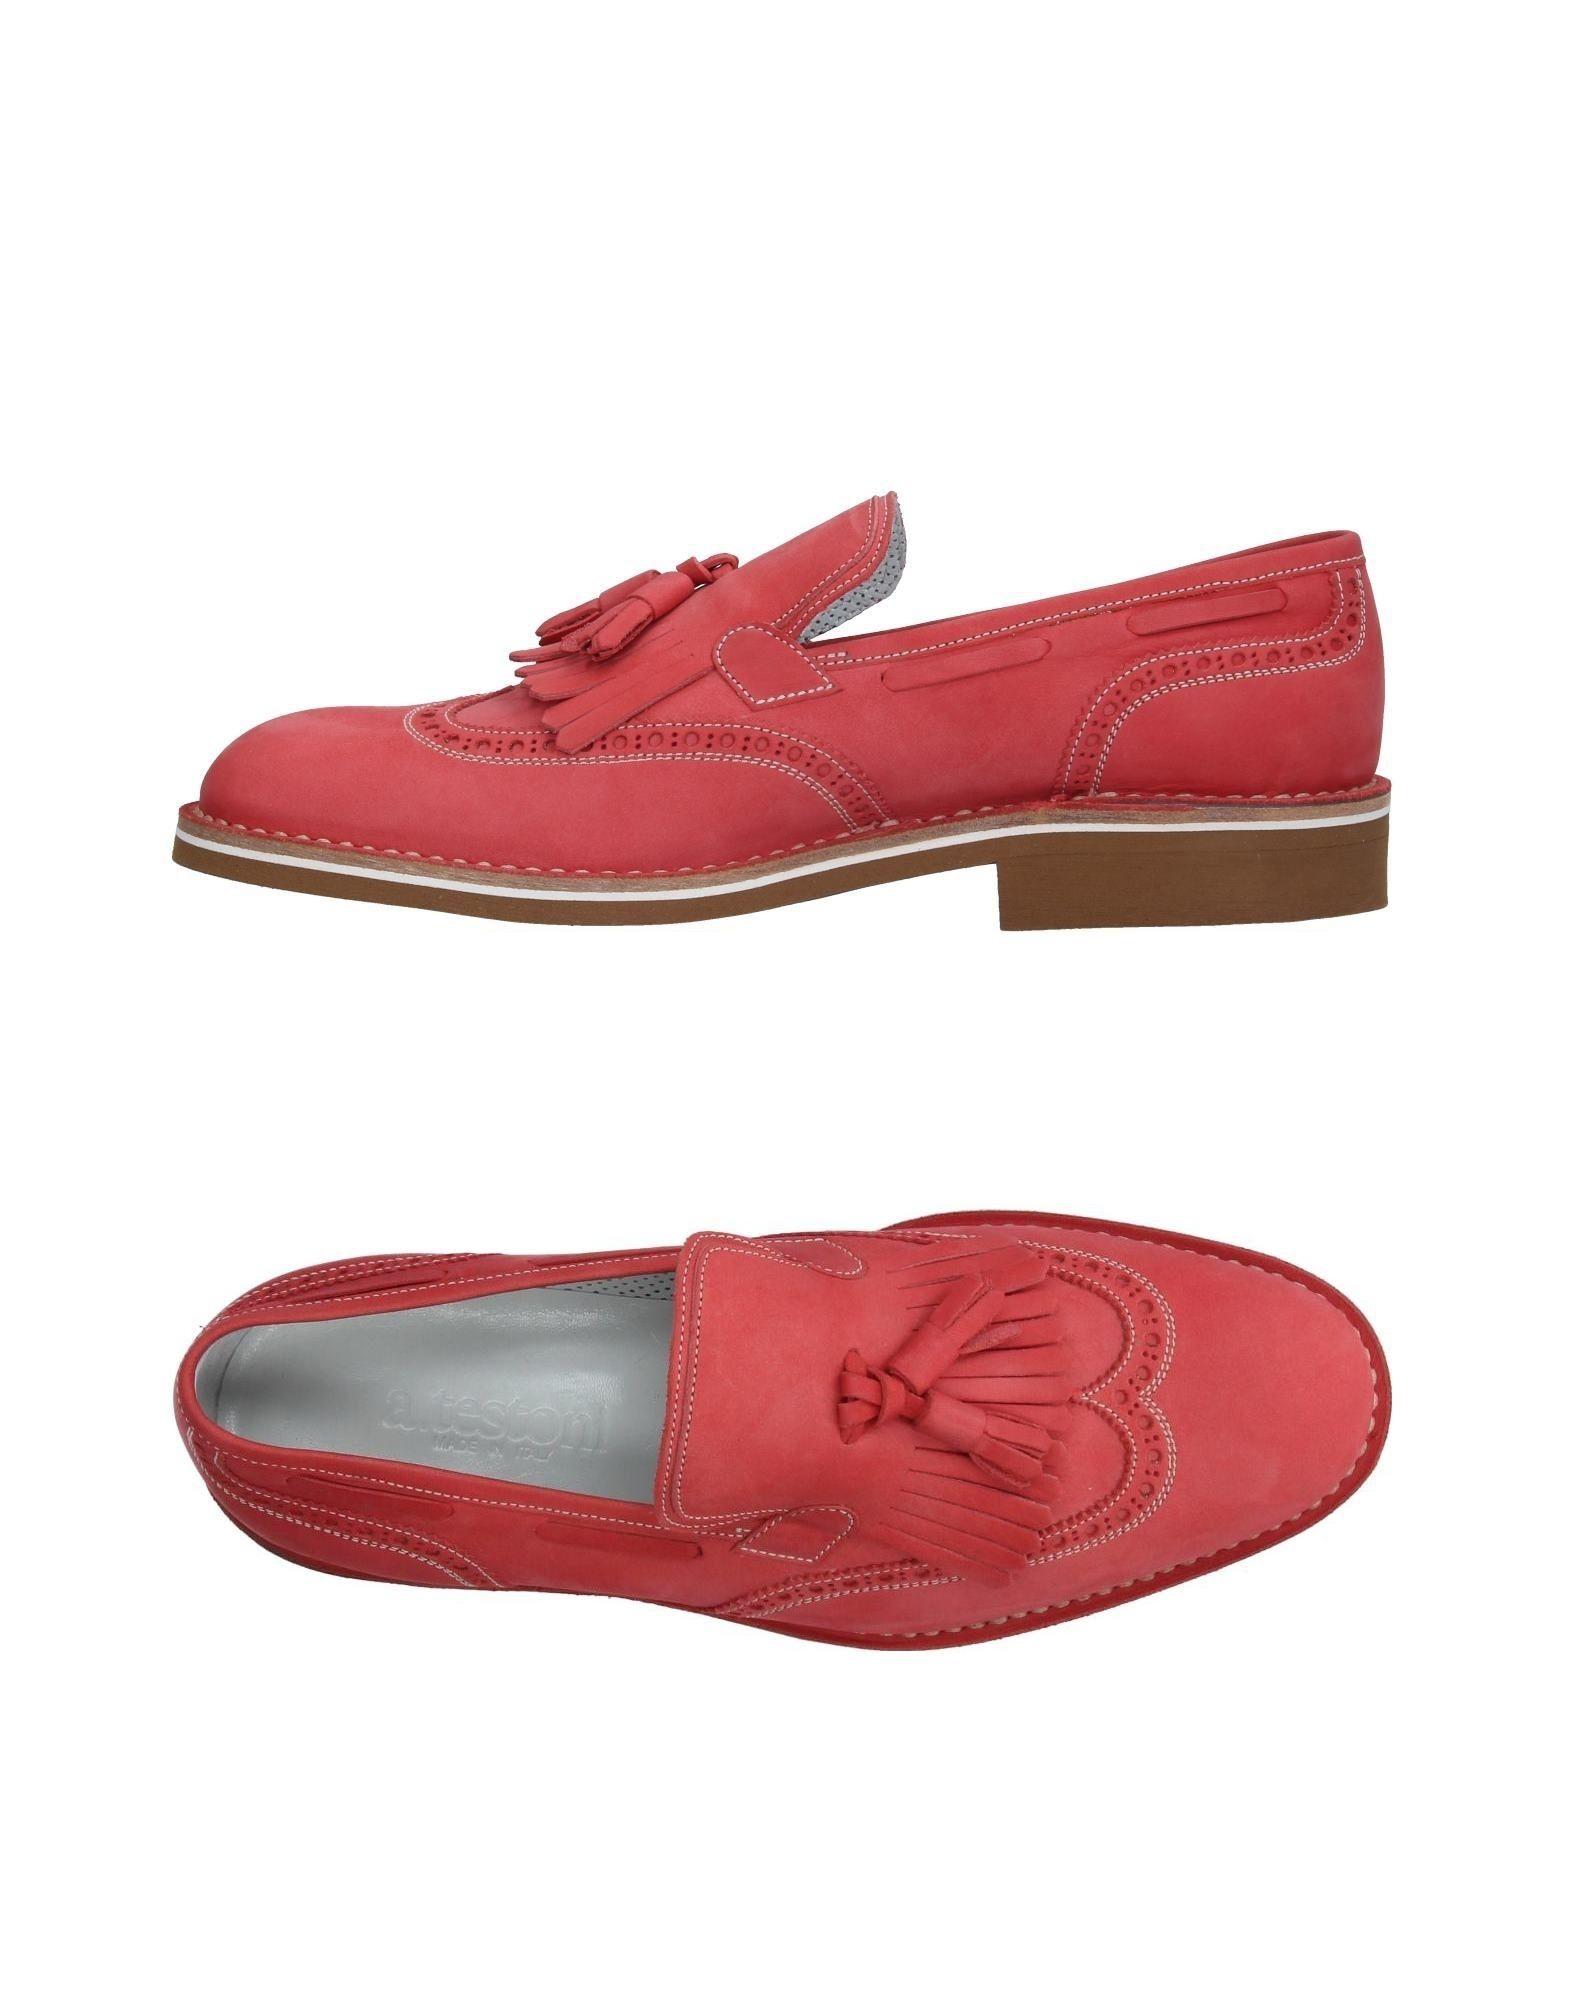 A.Testoni Mokassins Herren  11206584SG Gute Qualität beliebte Schuhe